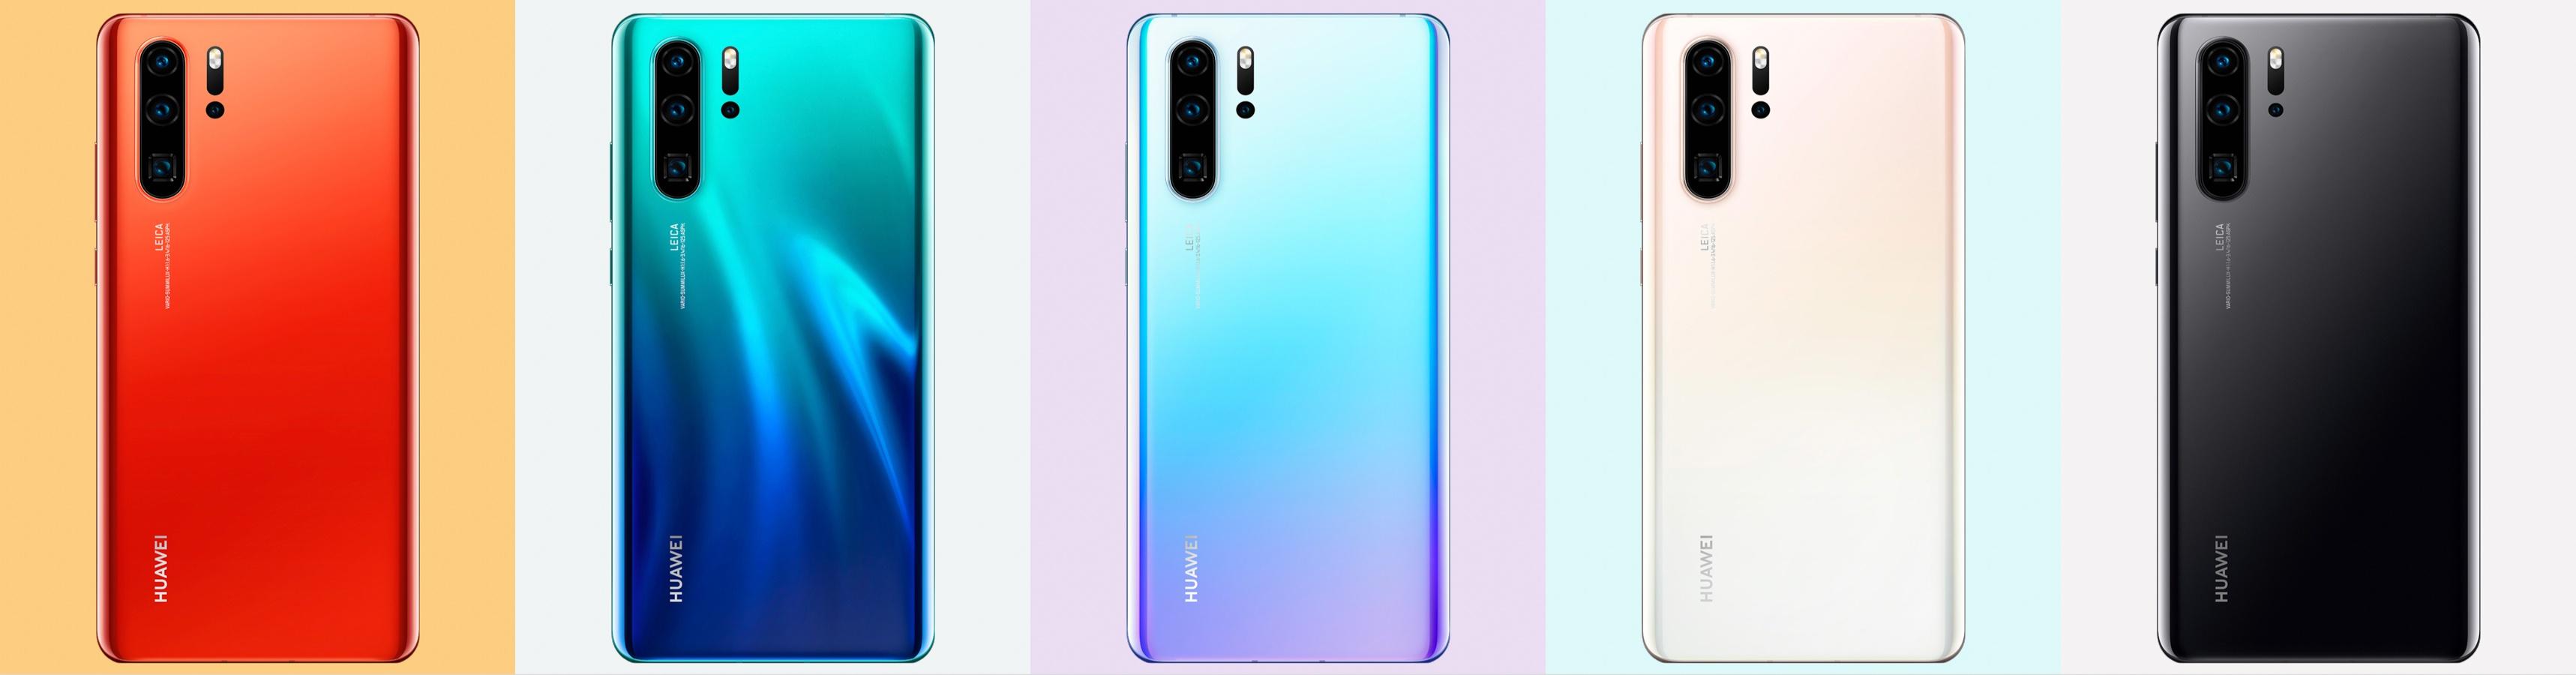 Huawei-P30-colors